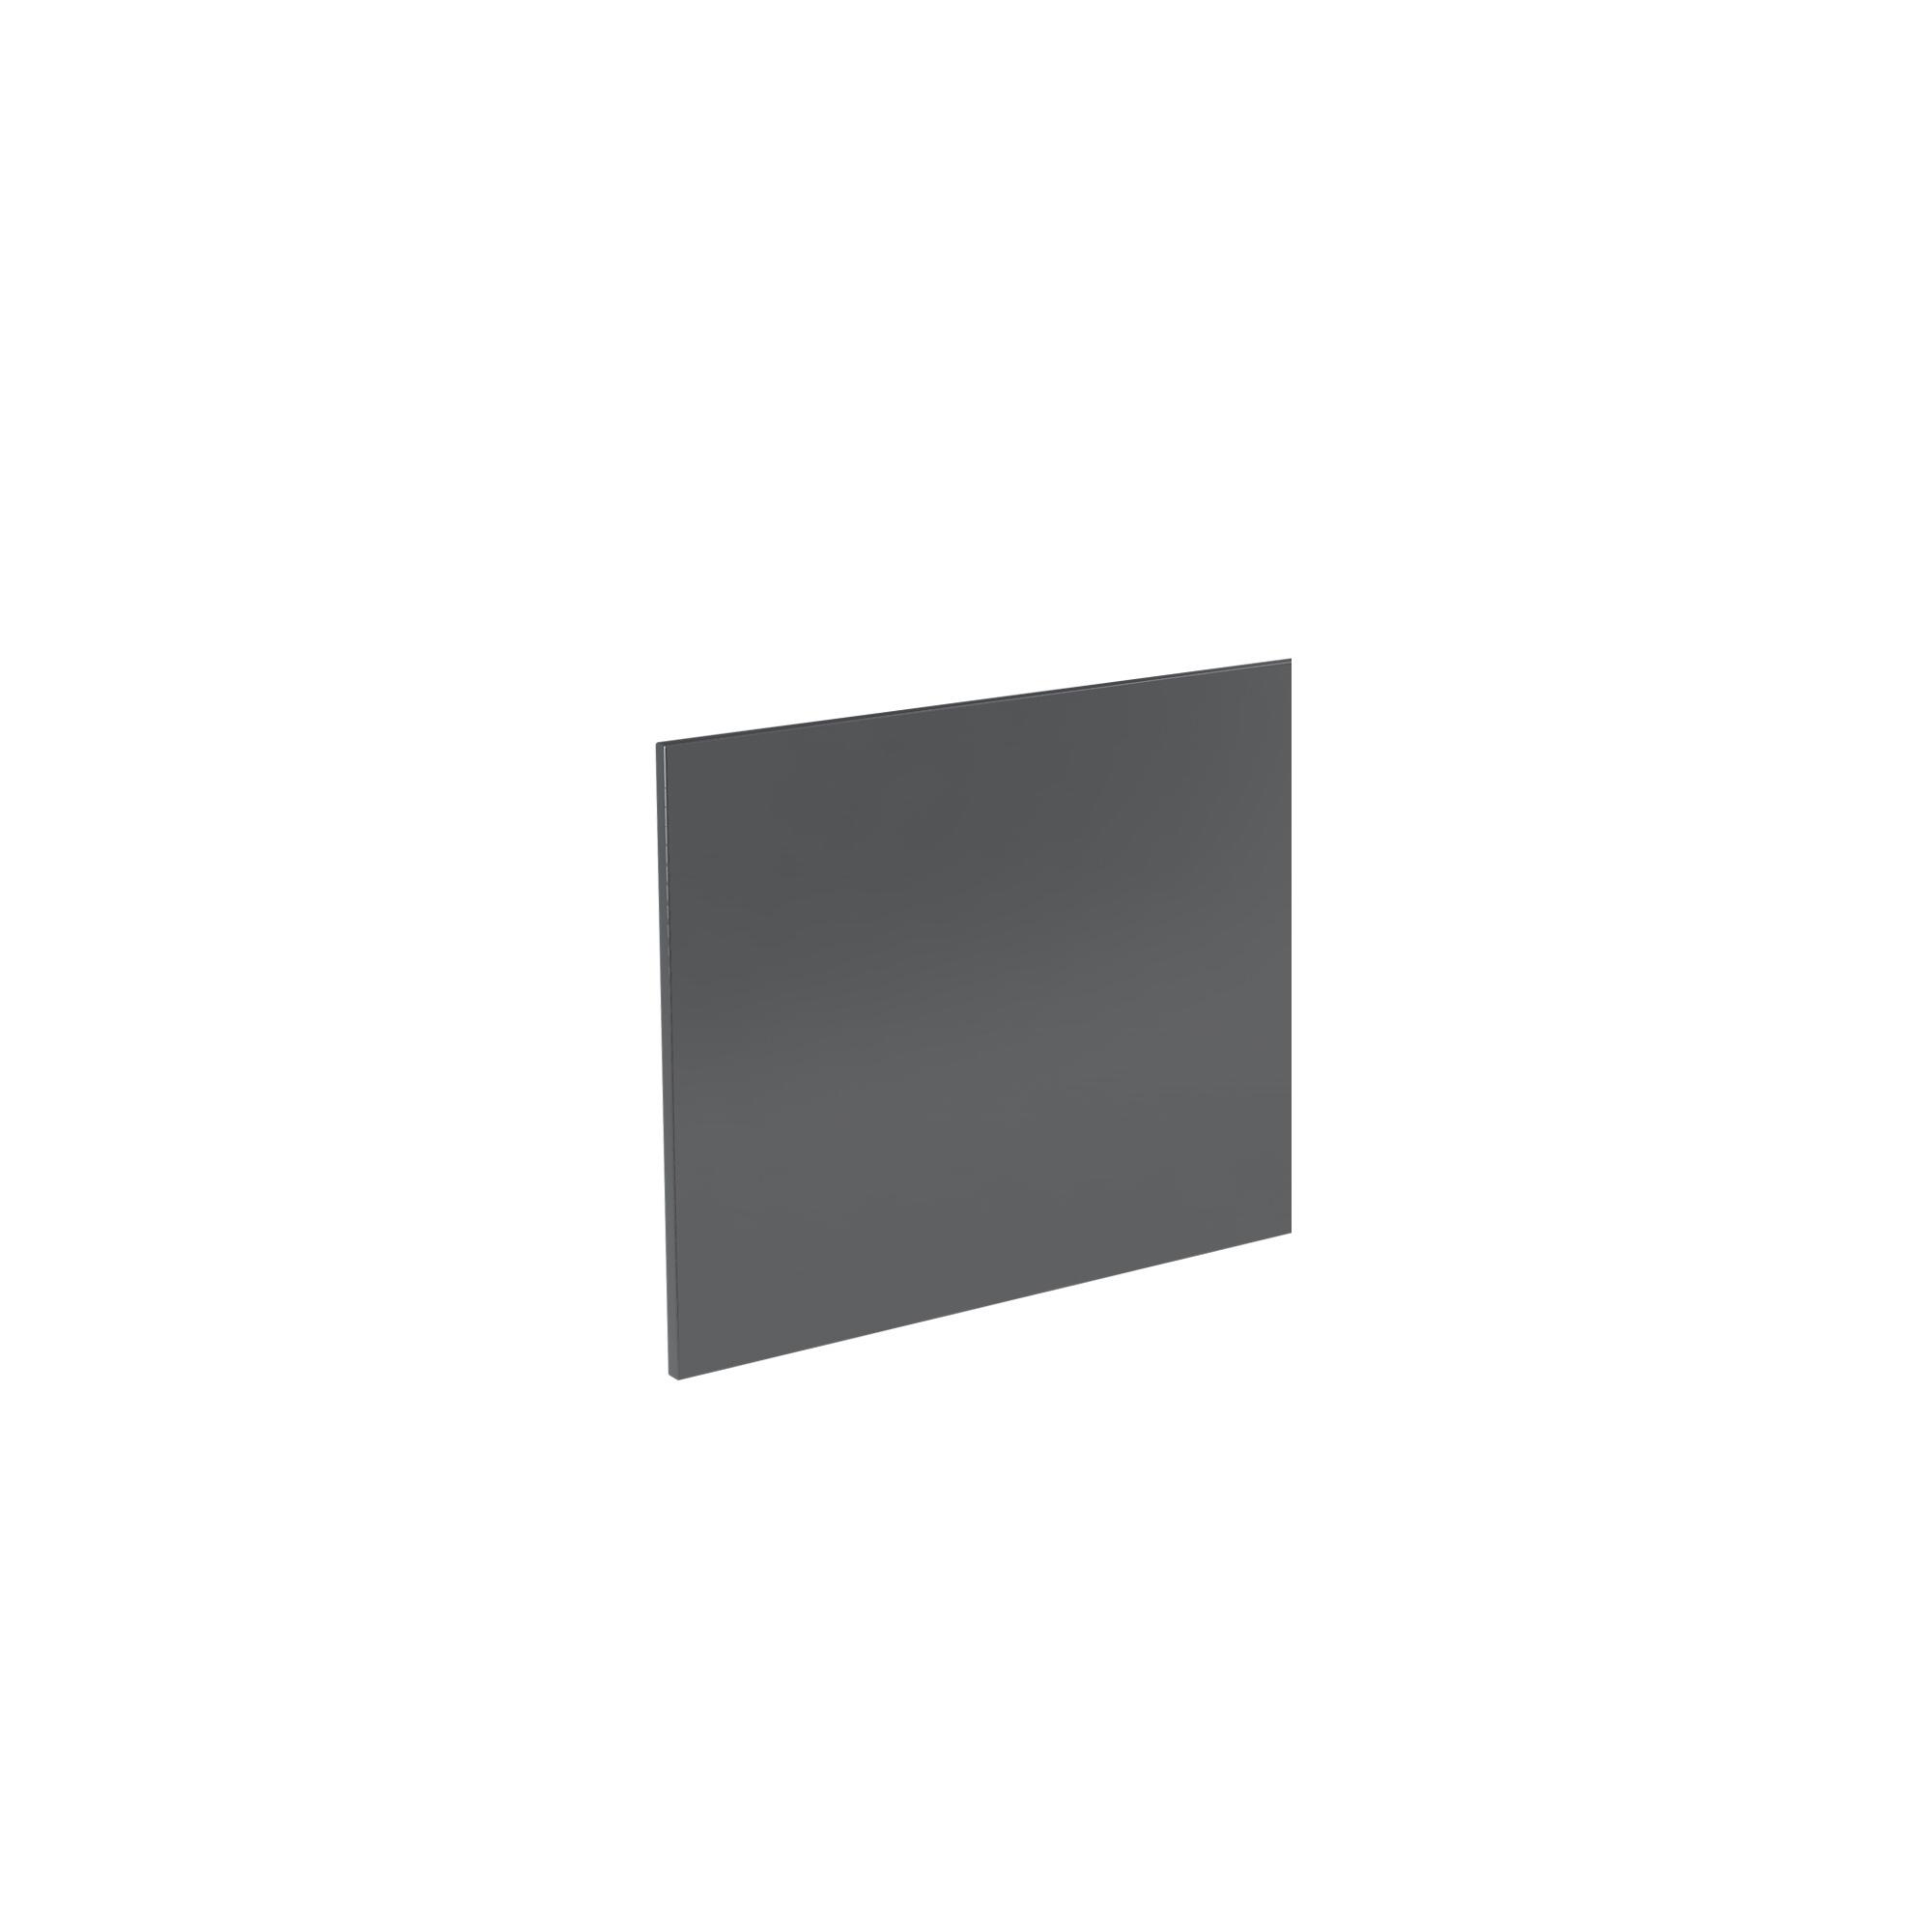 K-Vit Ikon 700mm Bath Panel - Gloss Grey